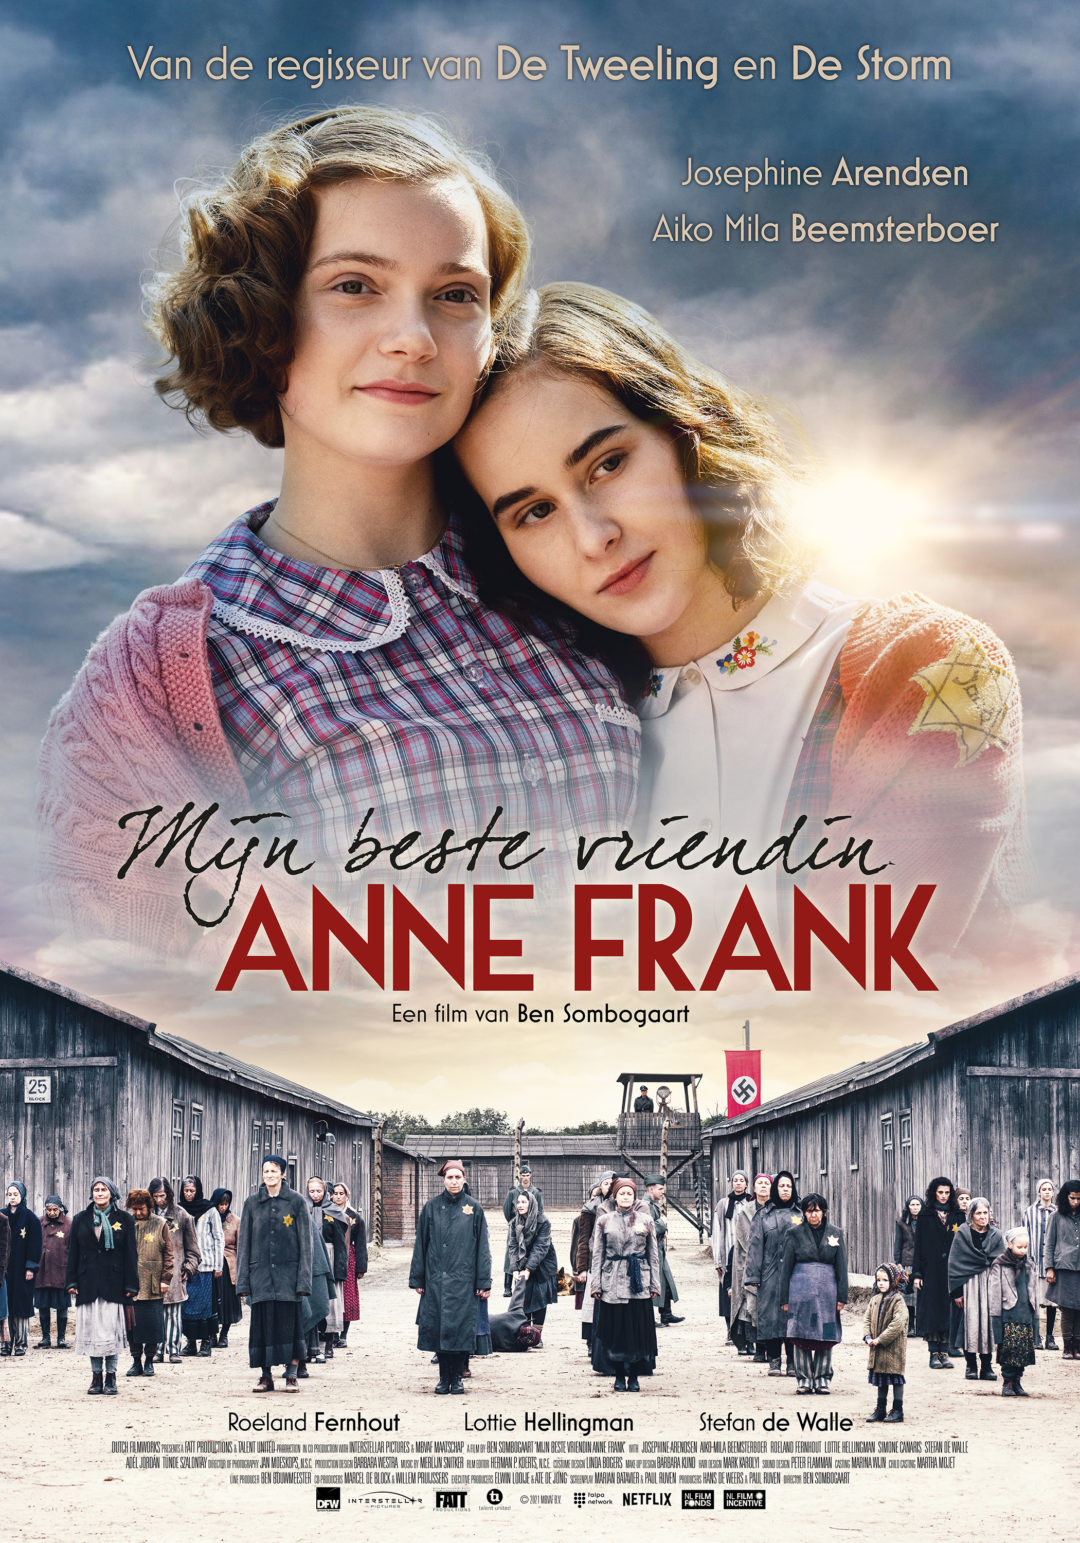 Mijn-Beste-Vriendin-Anne-Frank_ps_1_jpg_sd-high.jpg